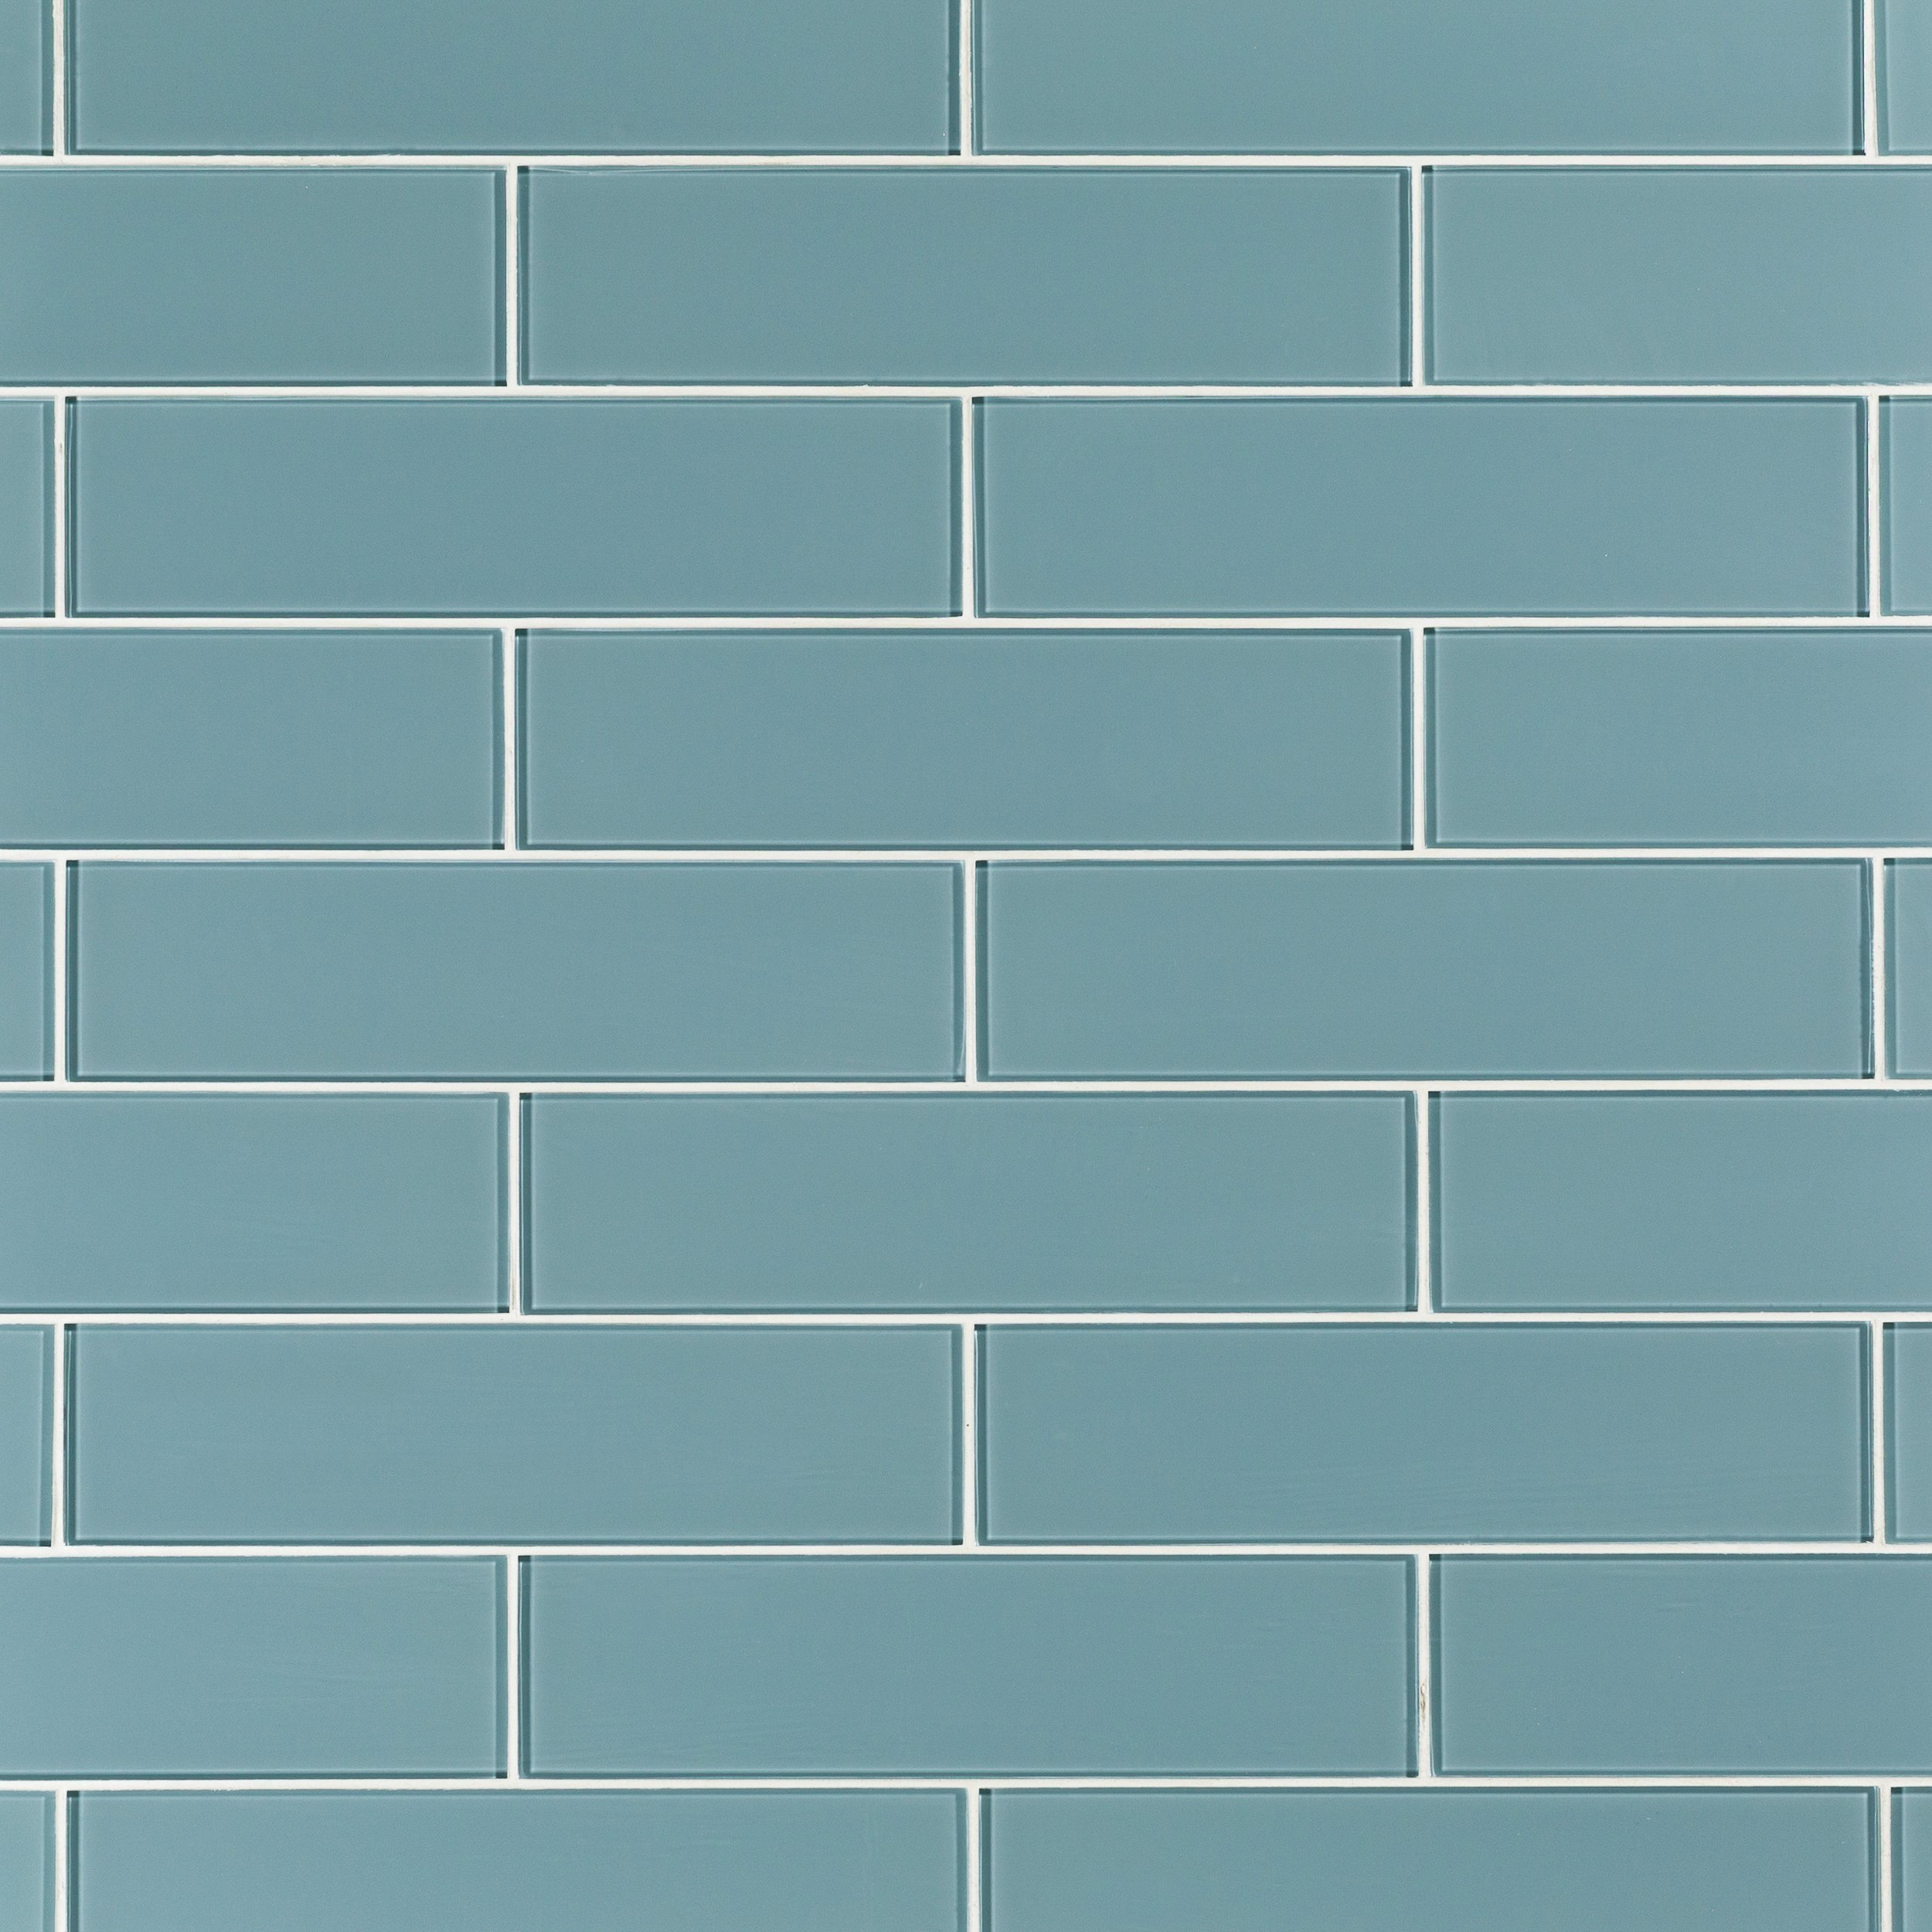 Spa Blue Glass Tile - 4 x 16 - 100465780 | Floor and Decor